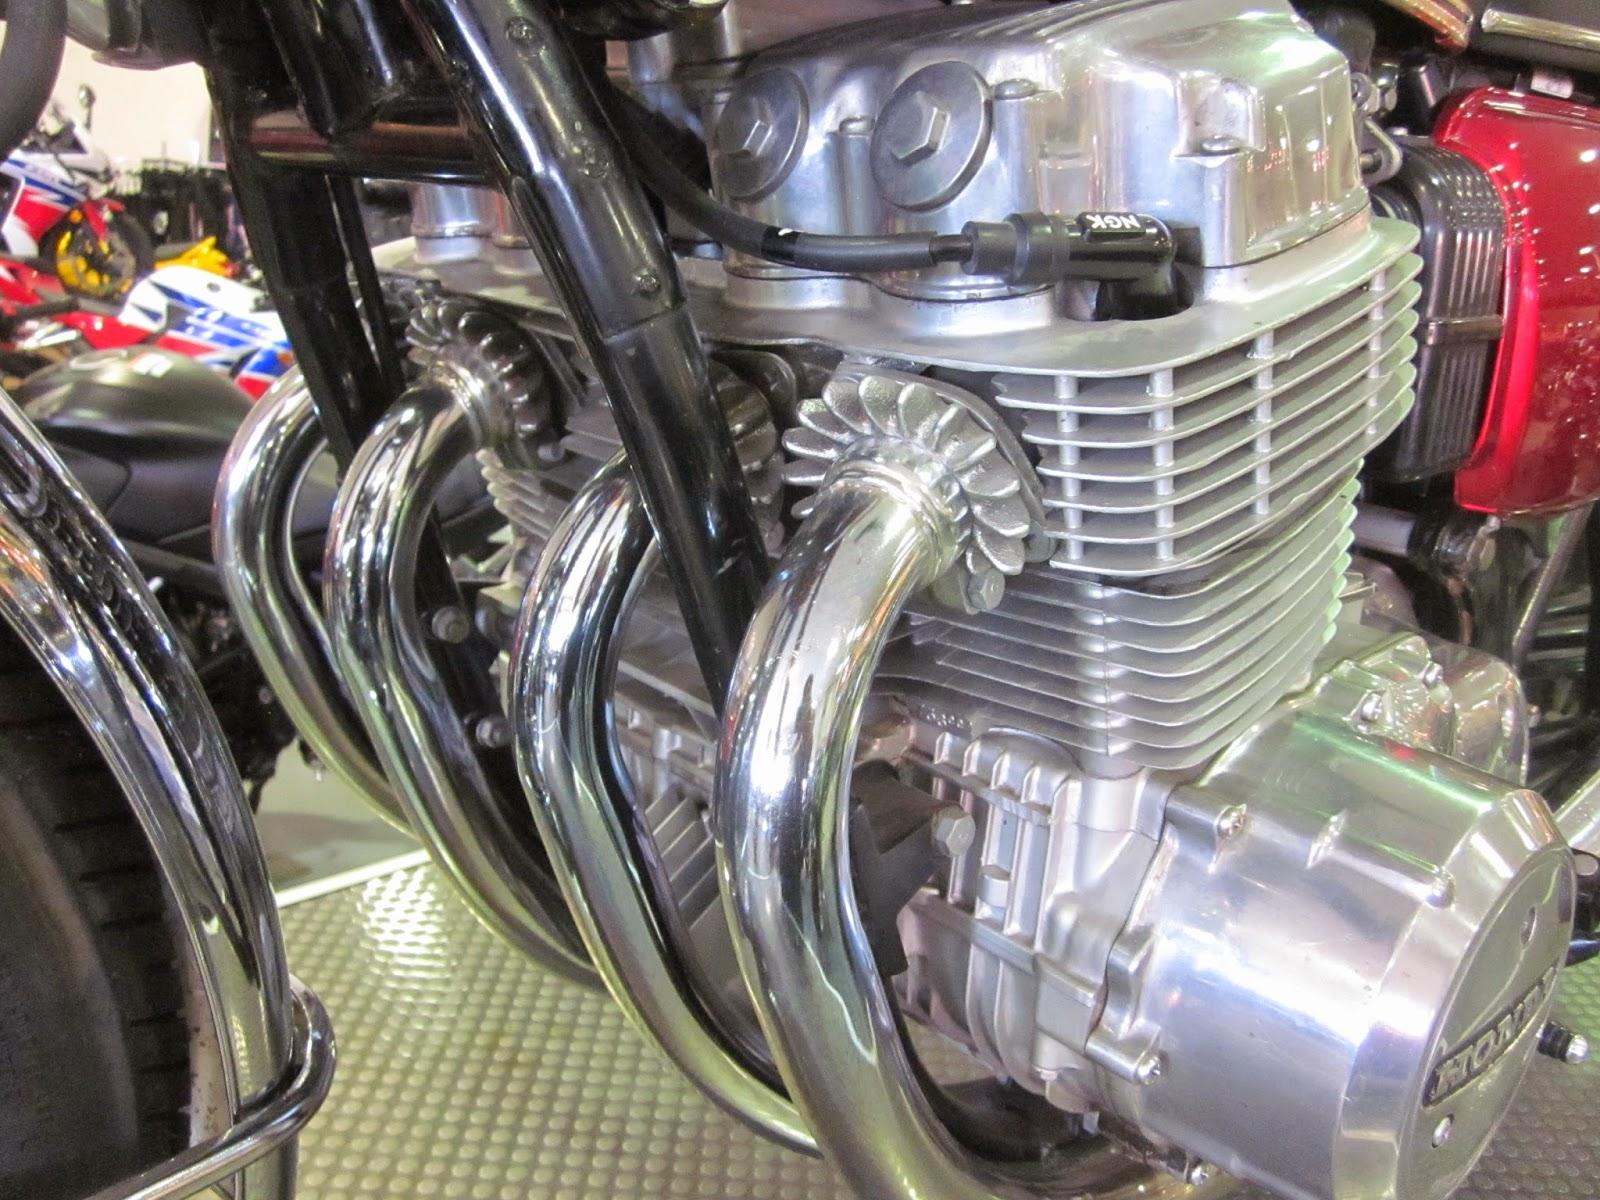 oldmotodude: 1971 honda cb750 k1 for sale at hinshaw's motorcycle